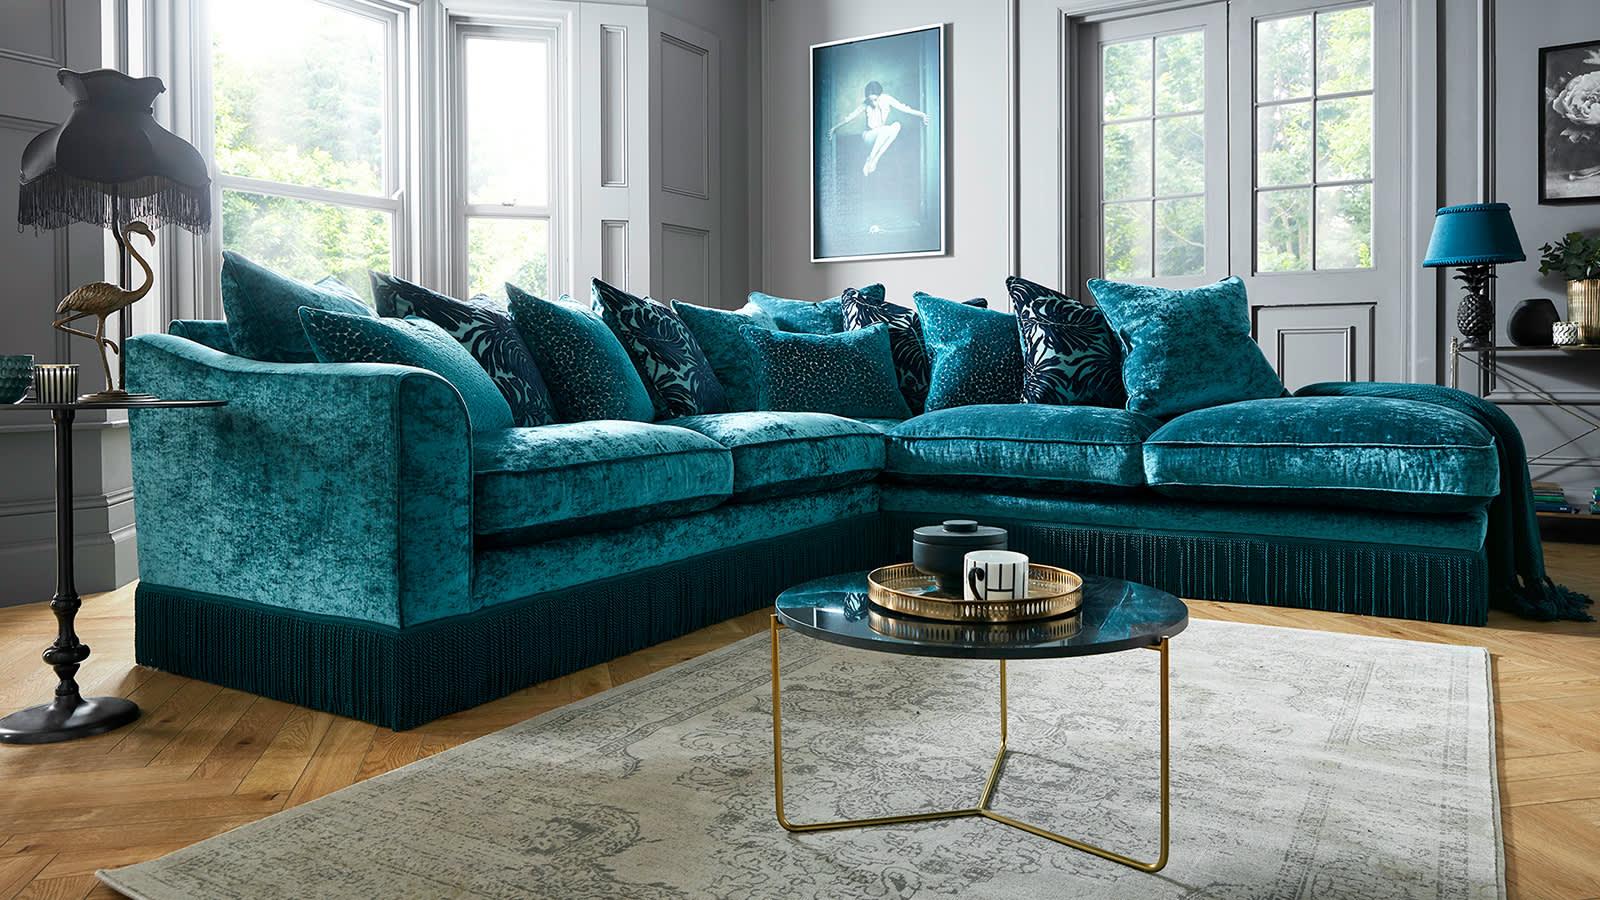 Sofology Vivienne teal fabric sofa